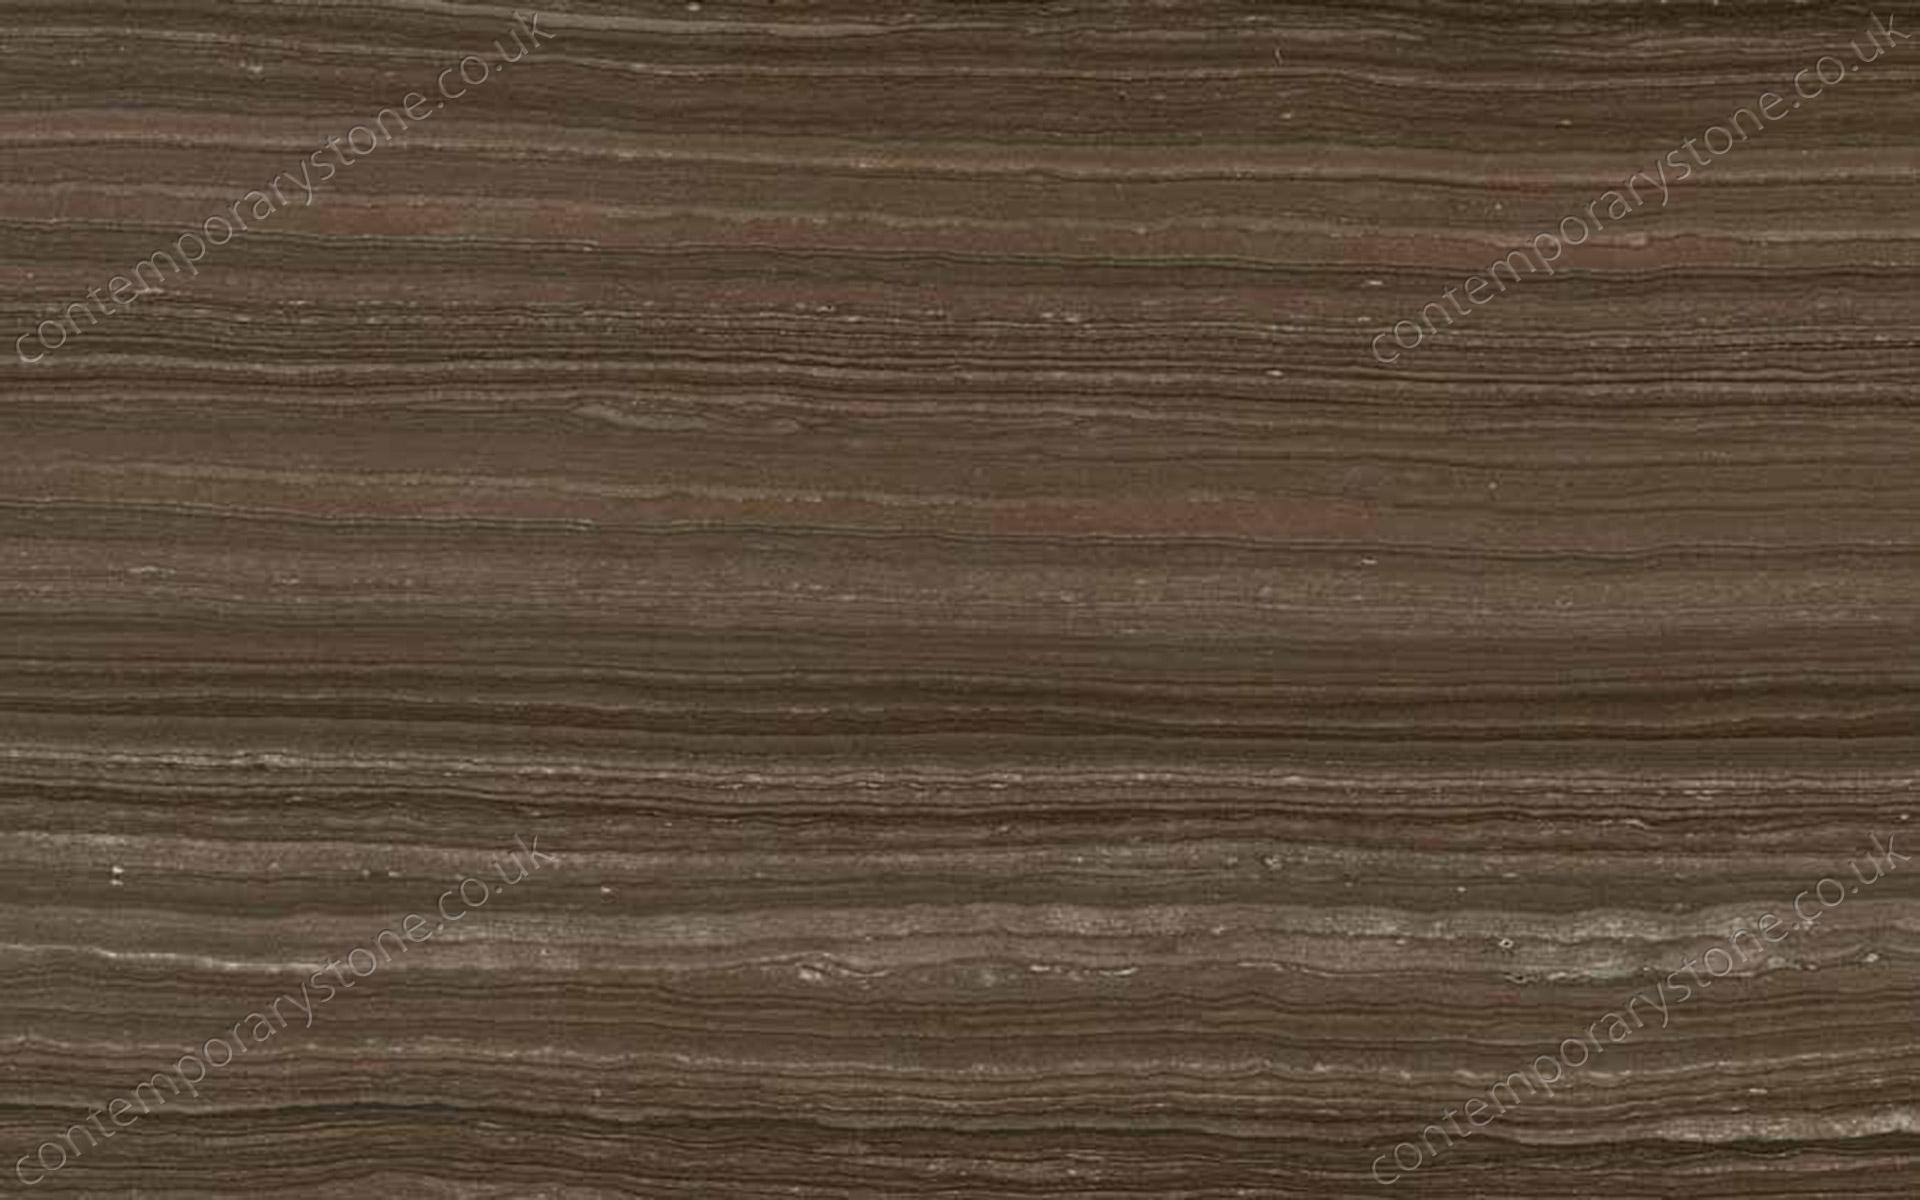 Eramosa vc marble close-up